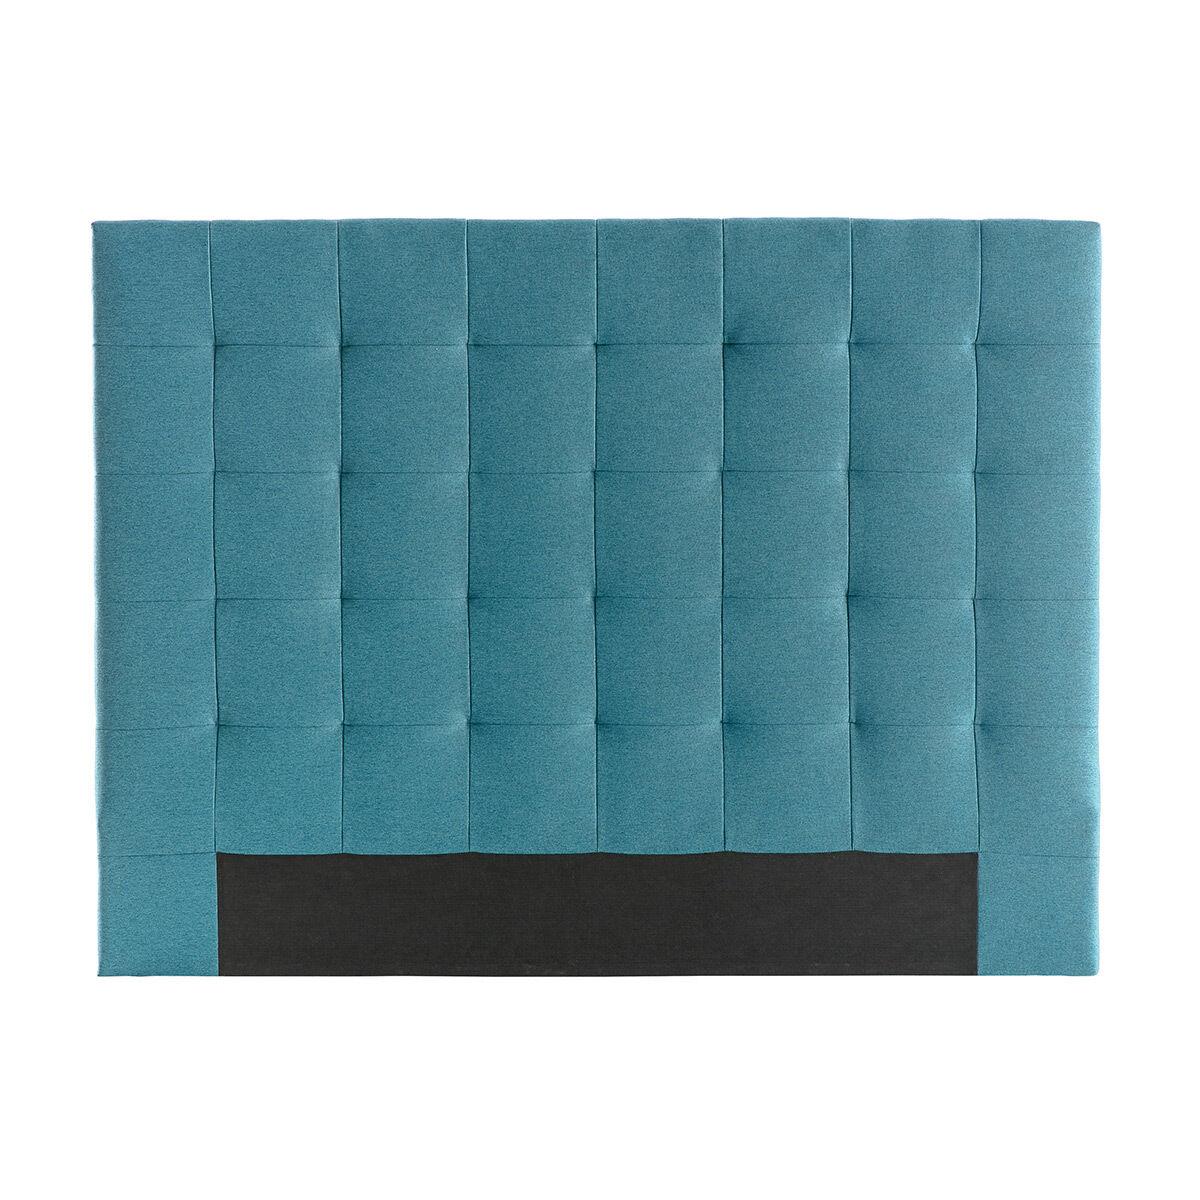 Miliboo Tête de lit capitonnée en tissu bleu canard 140 cm HALCIONA